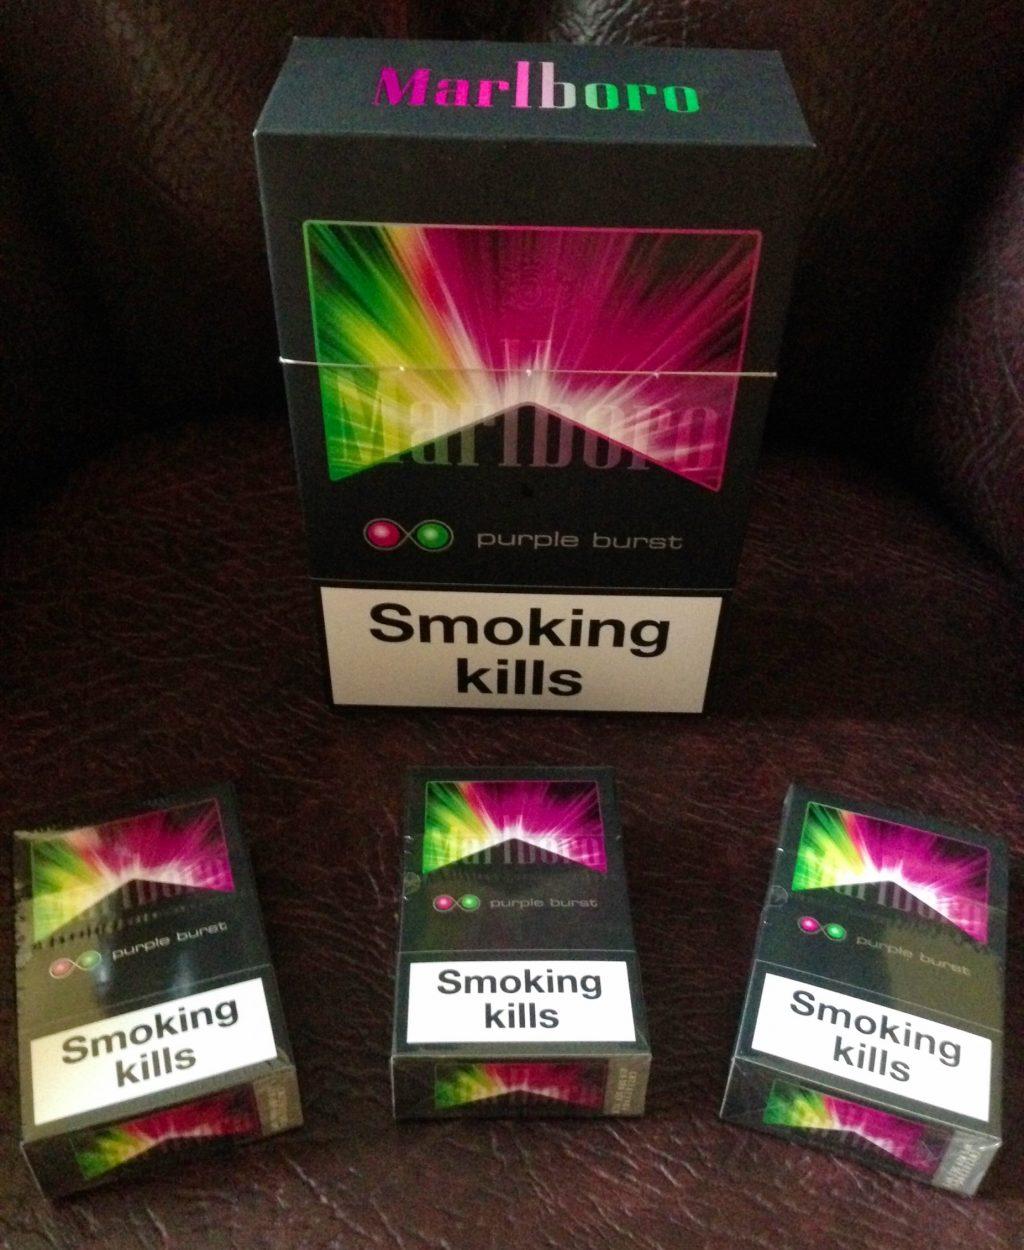 chiến lược Marketing của Marlboro- Smoking kills